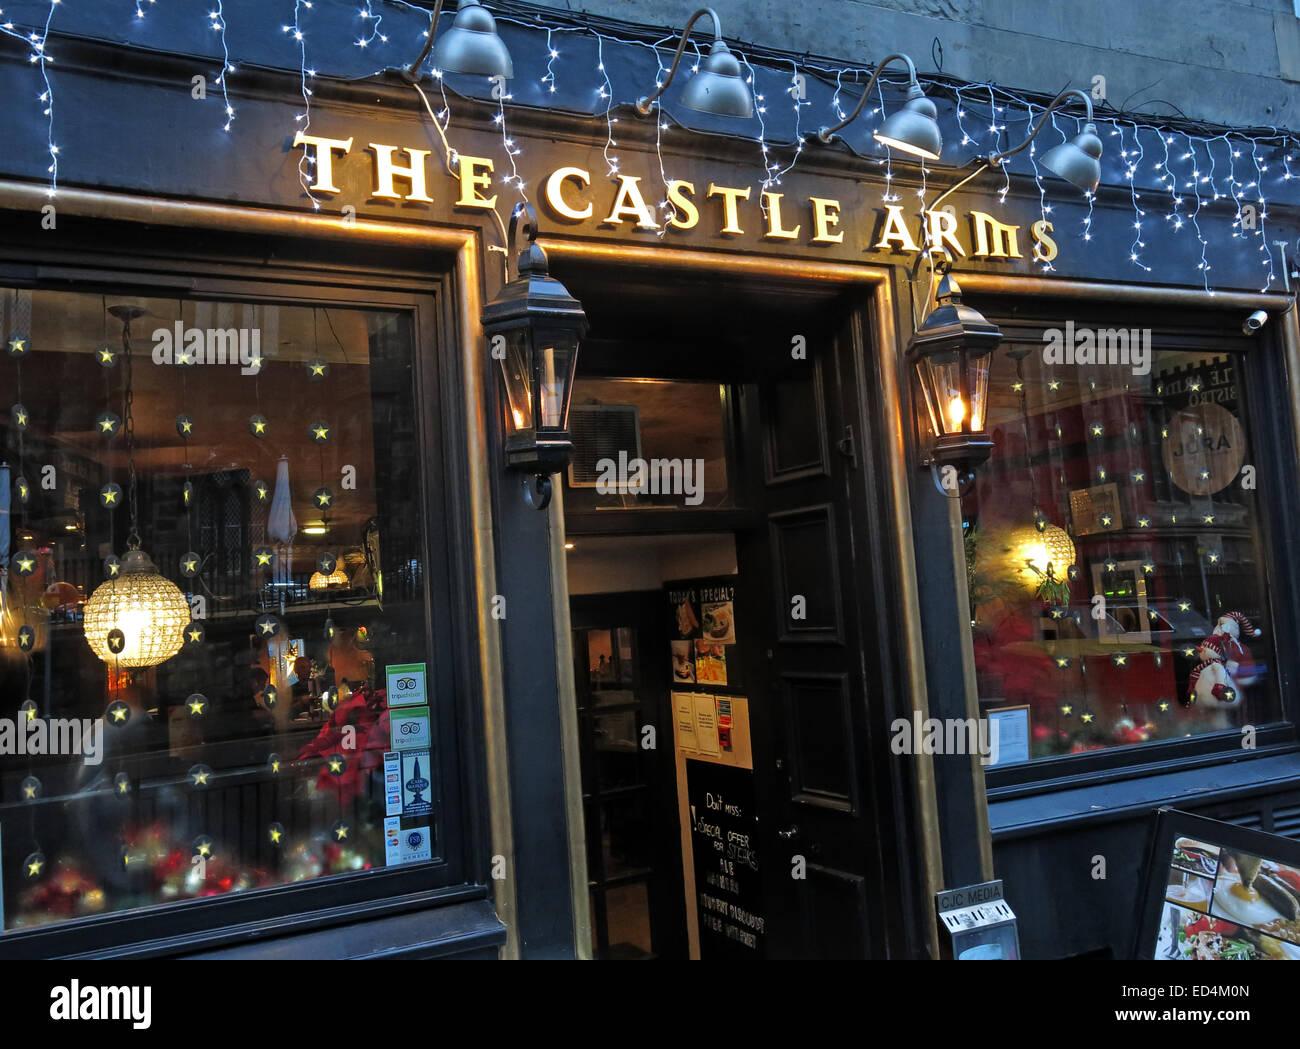 The Castle Arms Pub, Edinburgh, Scotland, UK - Stock Image